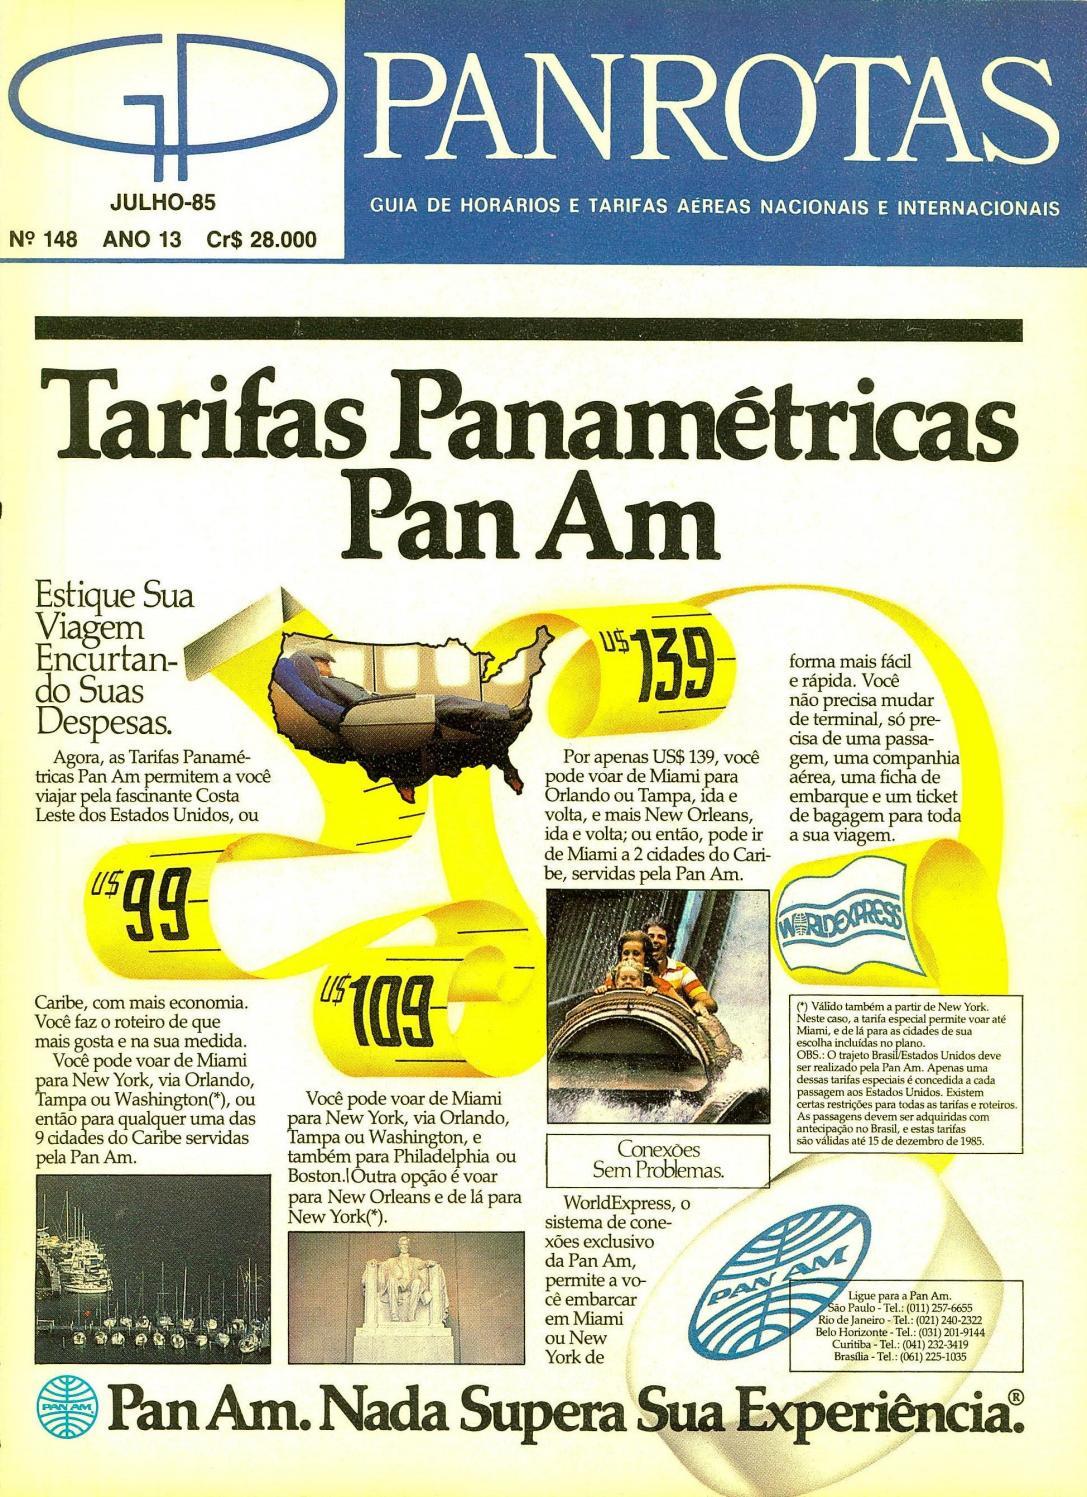 Guia PANROTAS - Edição 148 - Julho 1985 by PANROTAS Editora - issuu a87cb1f3ed6